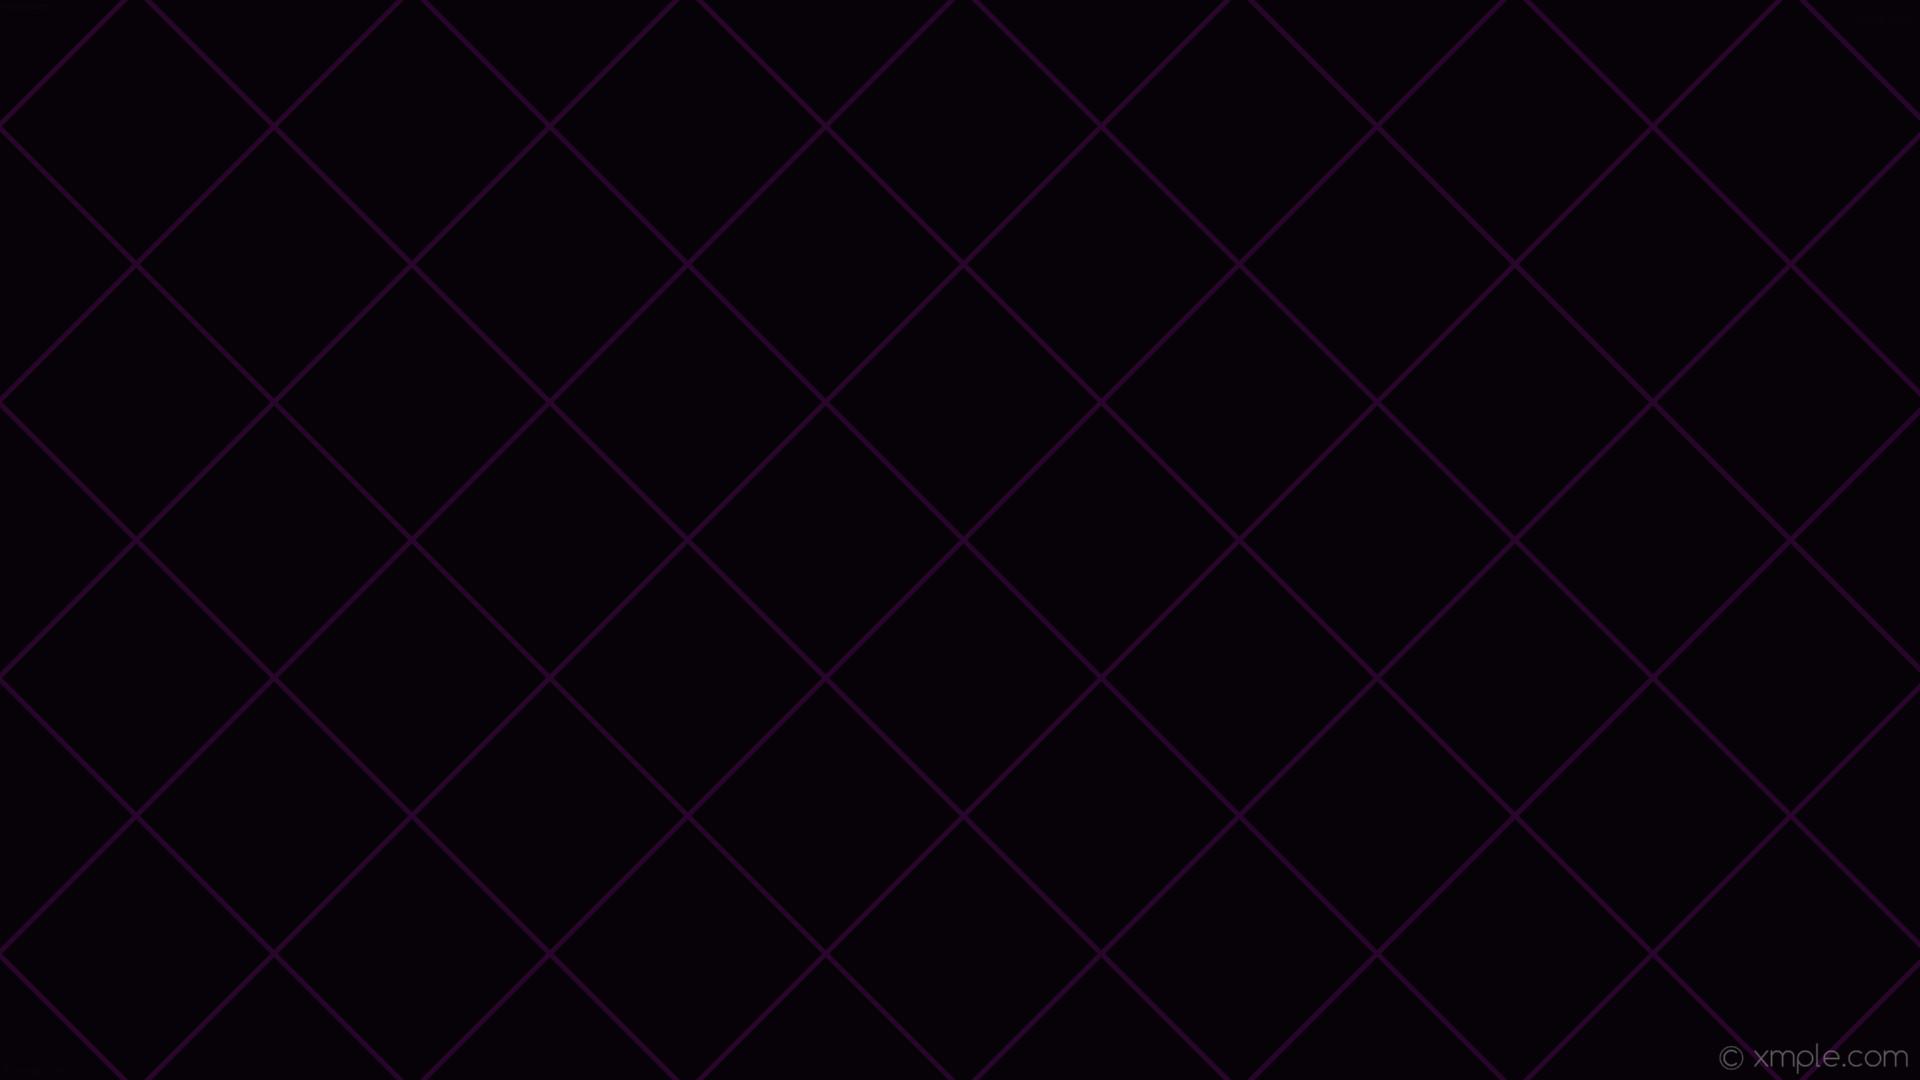 wallpaper grid magenta graph paper black dark magenta #070207 #36073a 45°  5px 195px